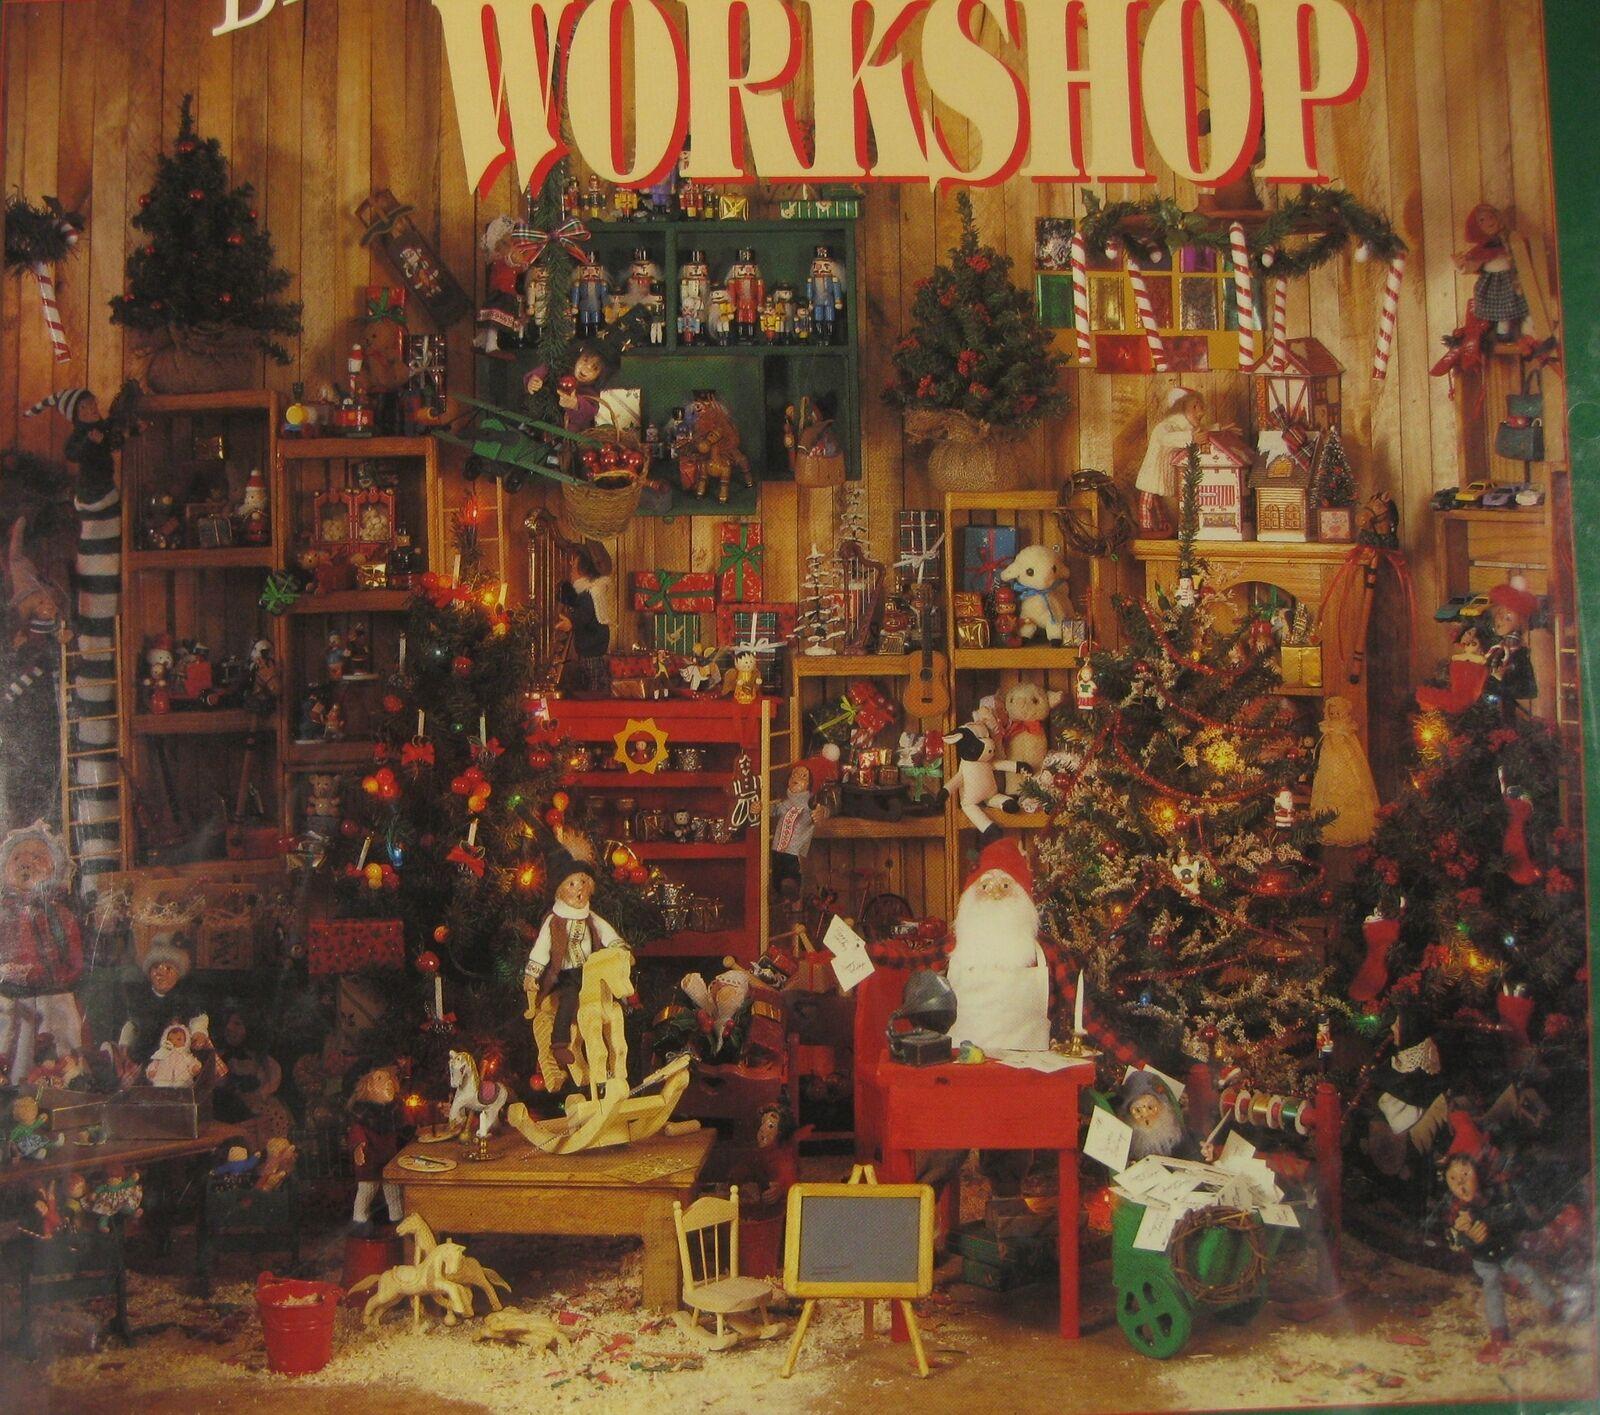 Byers Choice Santa's Workshop 500 Piece Sealed 1994 Jigsaw Puzzle 18x24